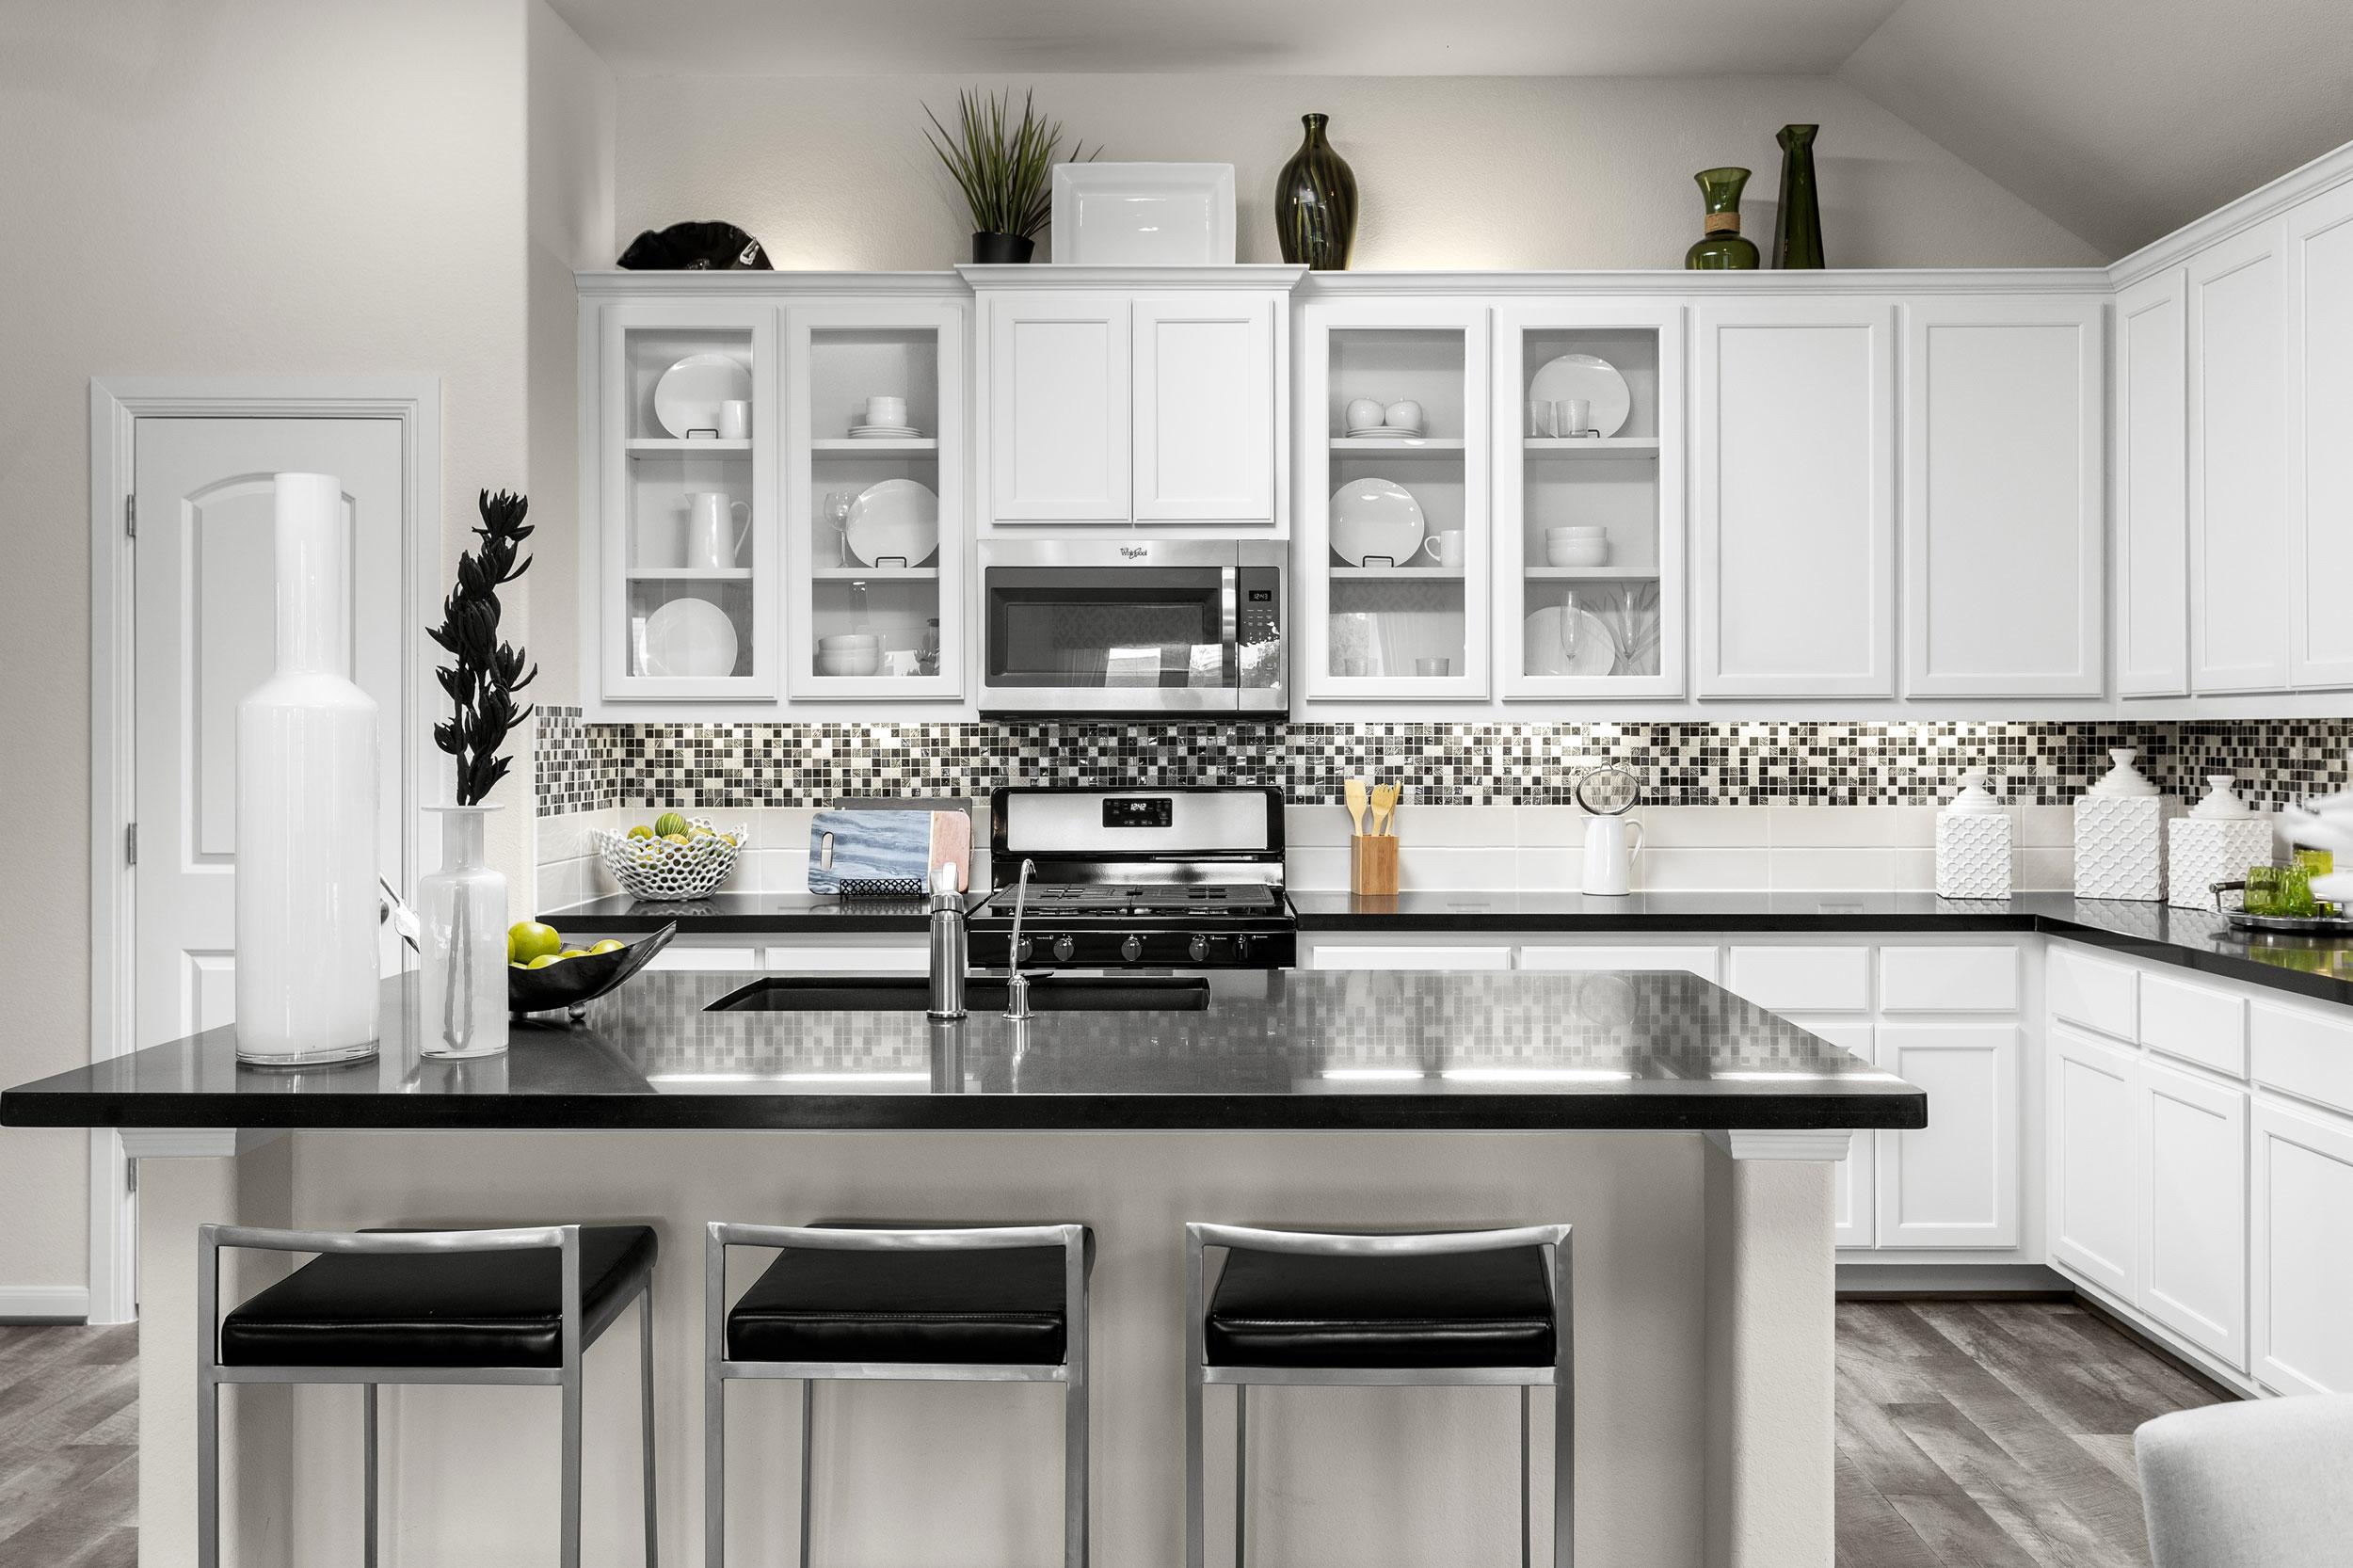 kitchen-design-white-cabinets-black-countertops.jpg